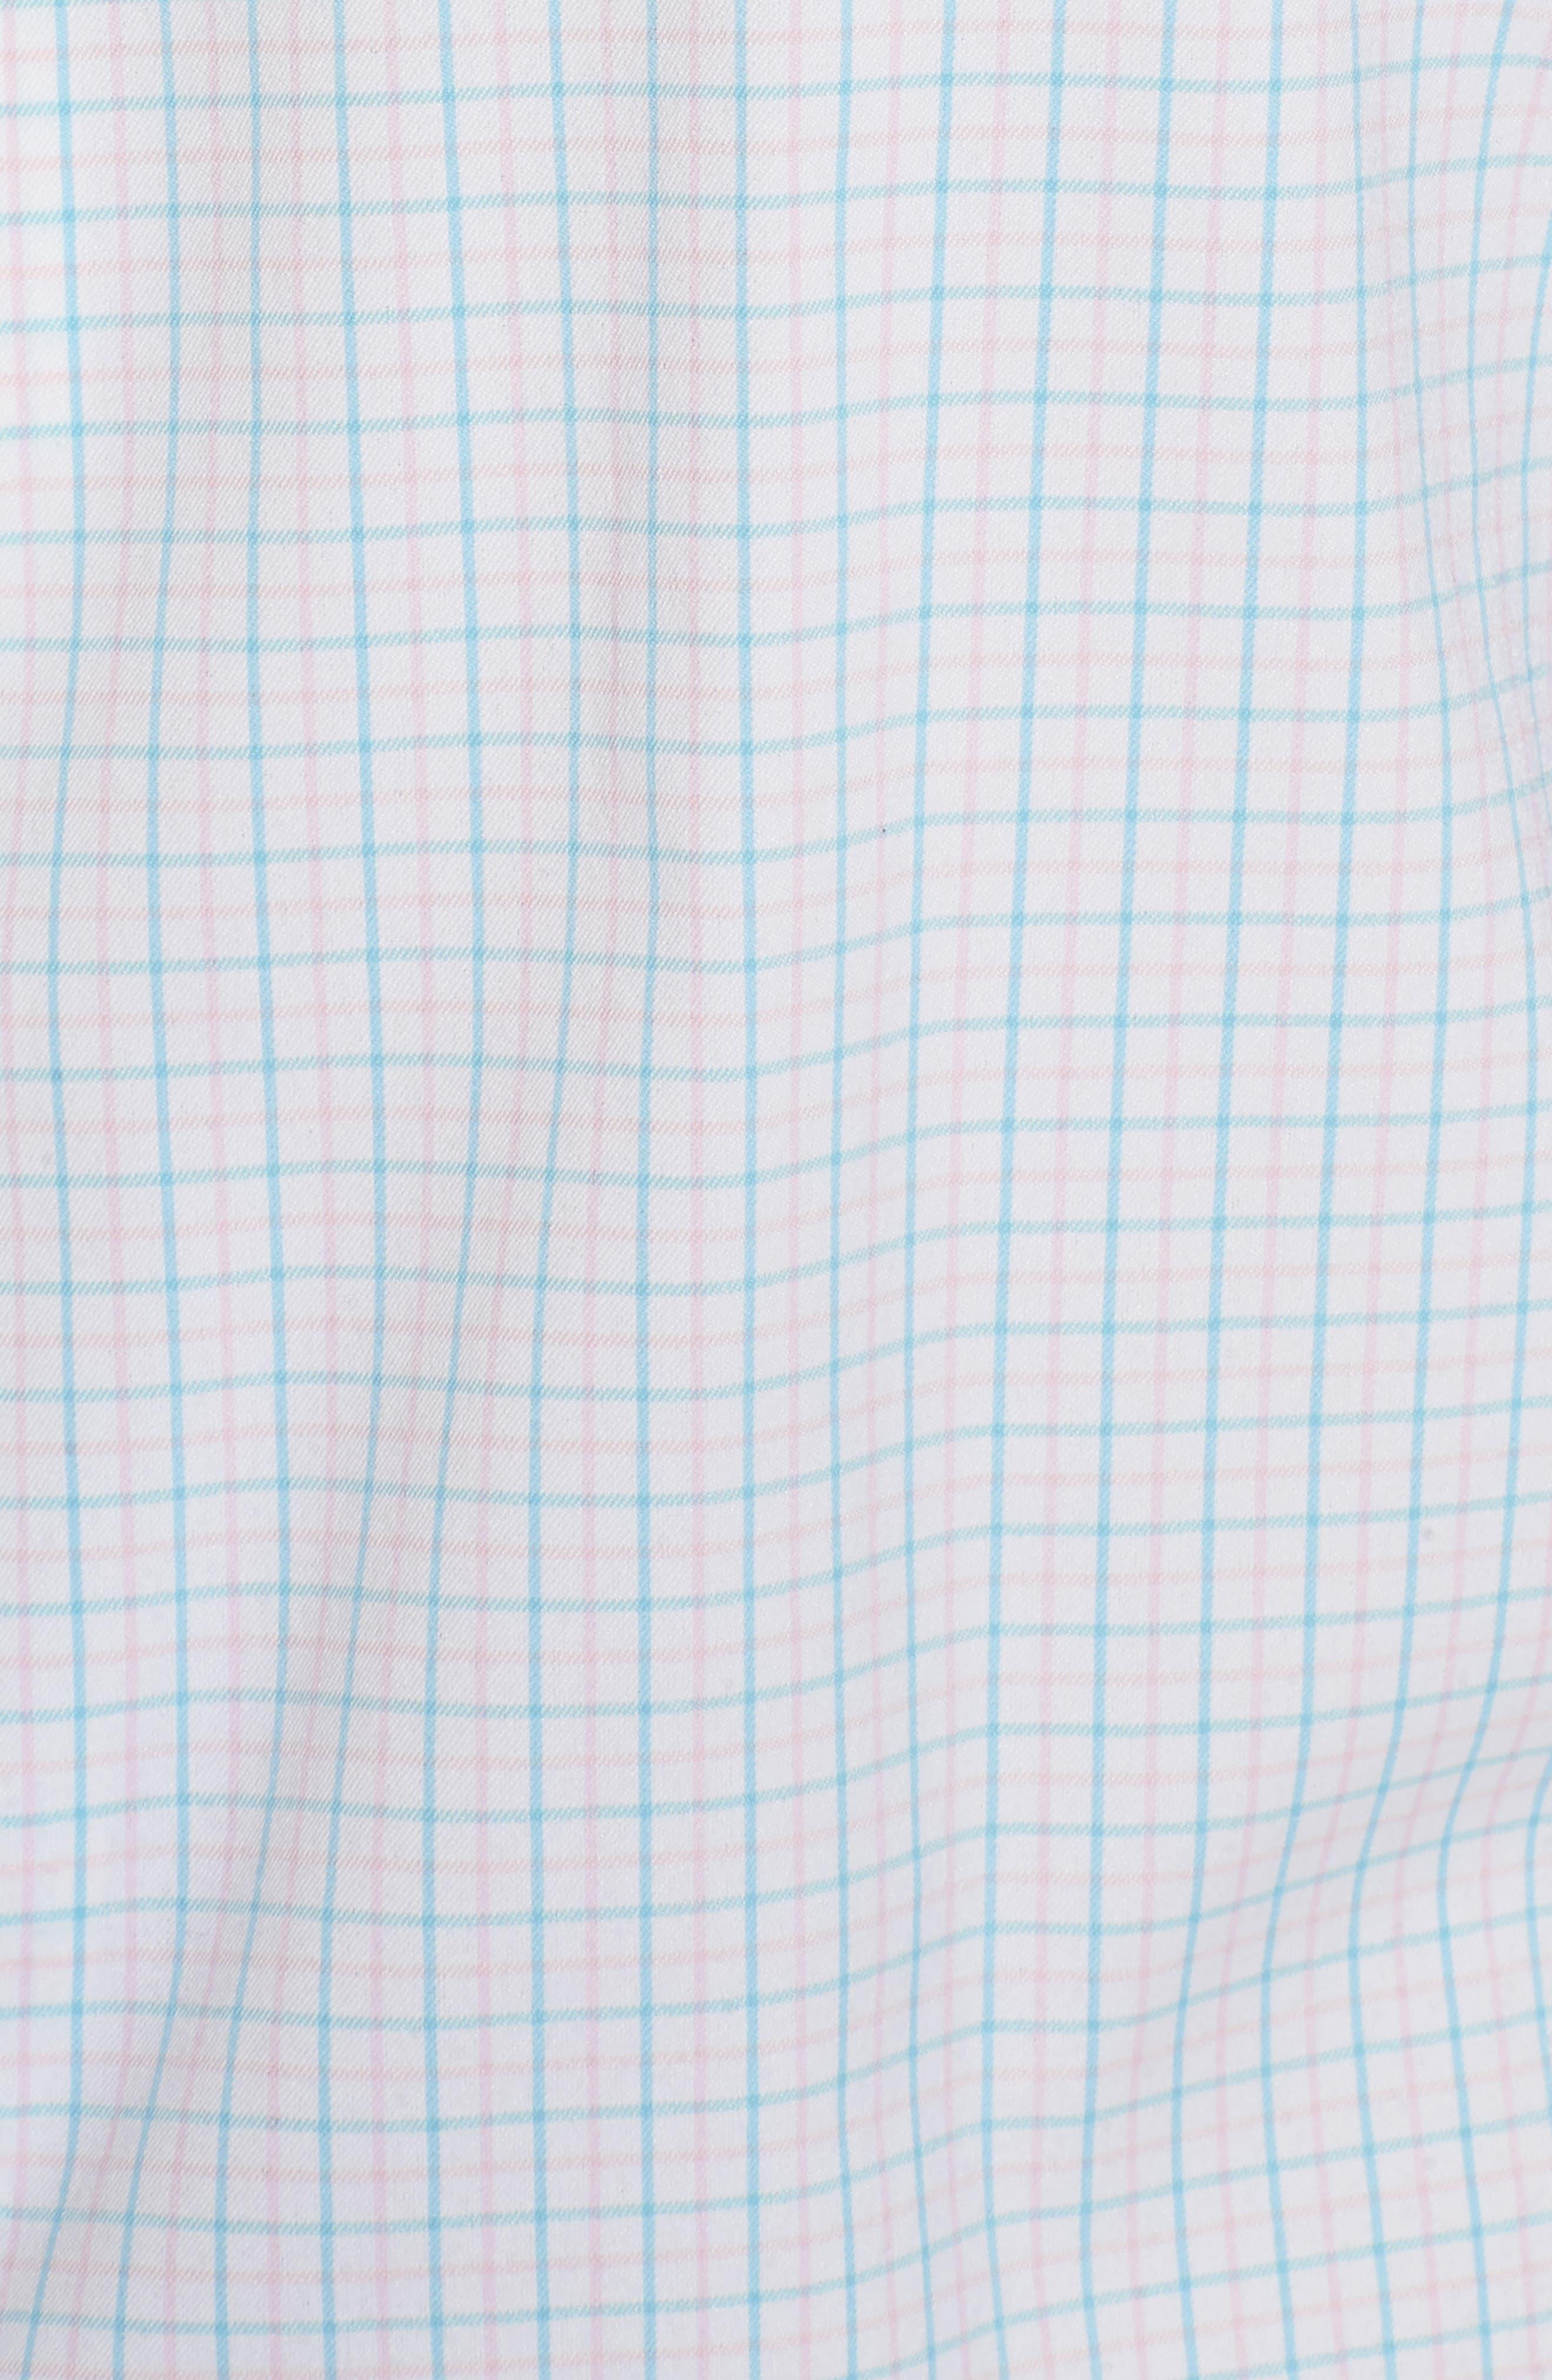 Waldorf Regular Fit Tattersall Performance Sport Shirt,                             Alternate thumbnail 5, color,                             White/ Piglet Pink